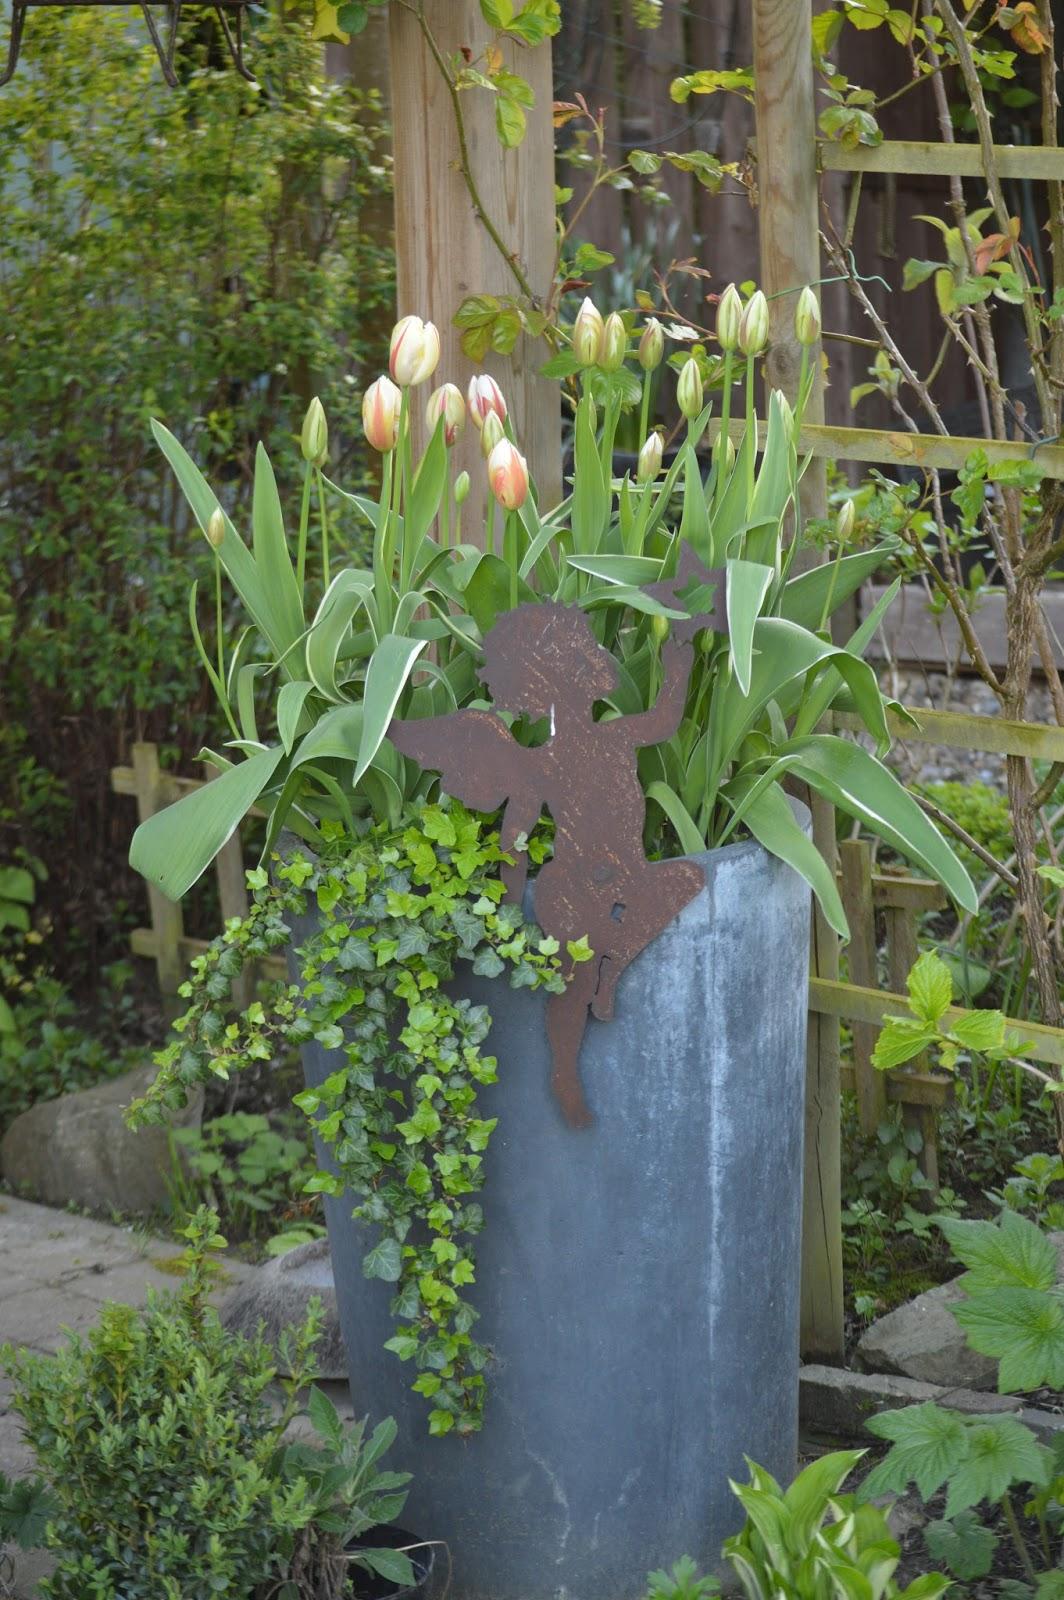 passionn 233 ment jardin derni 232 res tulipes du jardin 1